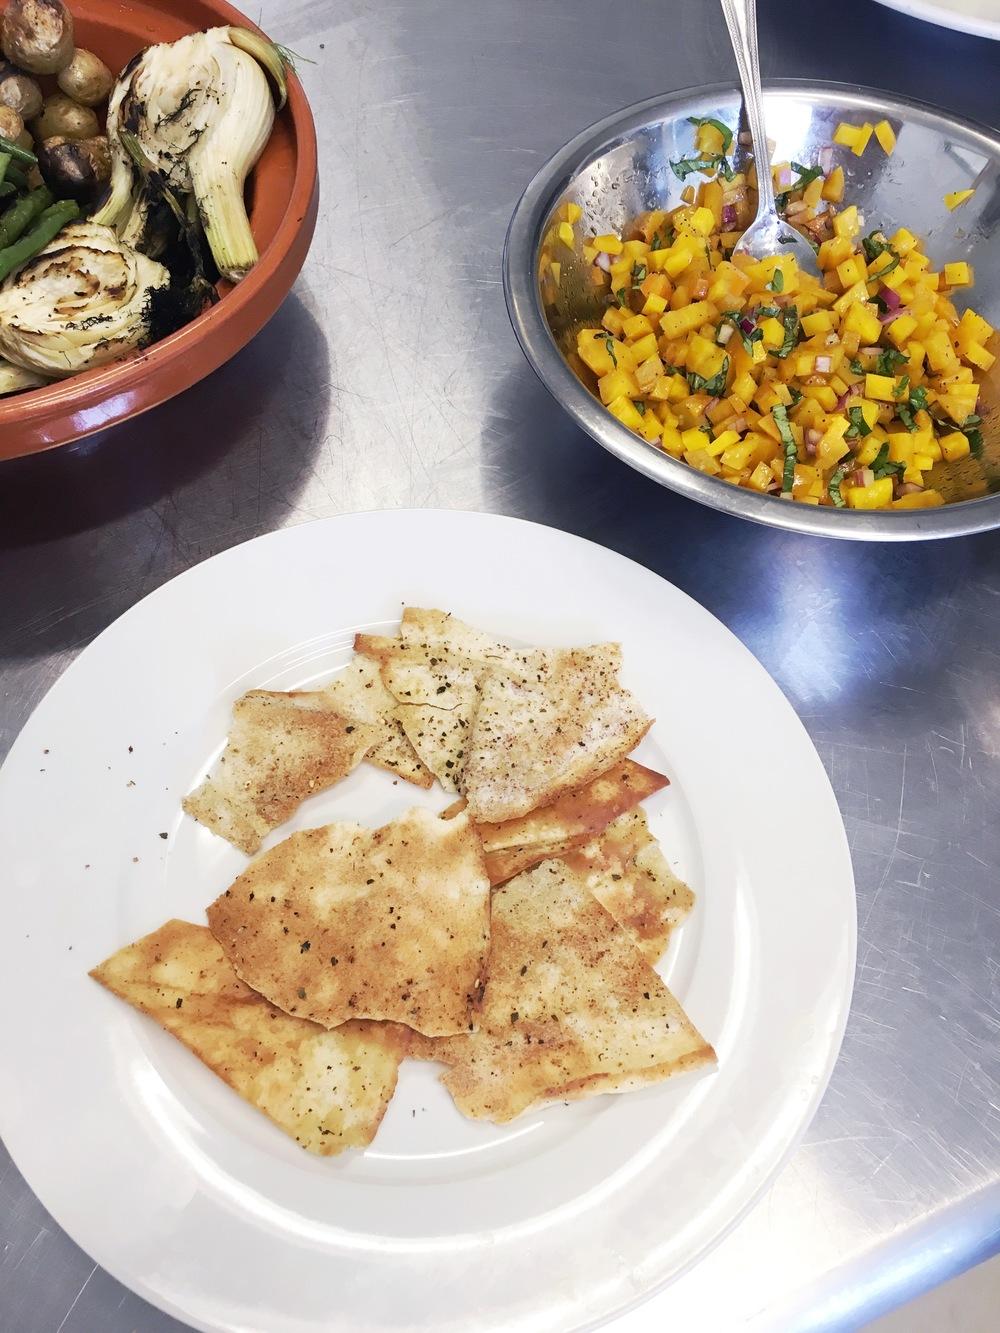 Yellow beet bruschetta on pita crisps. Roasted veggies with the super awesome plum sauce.